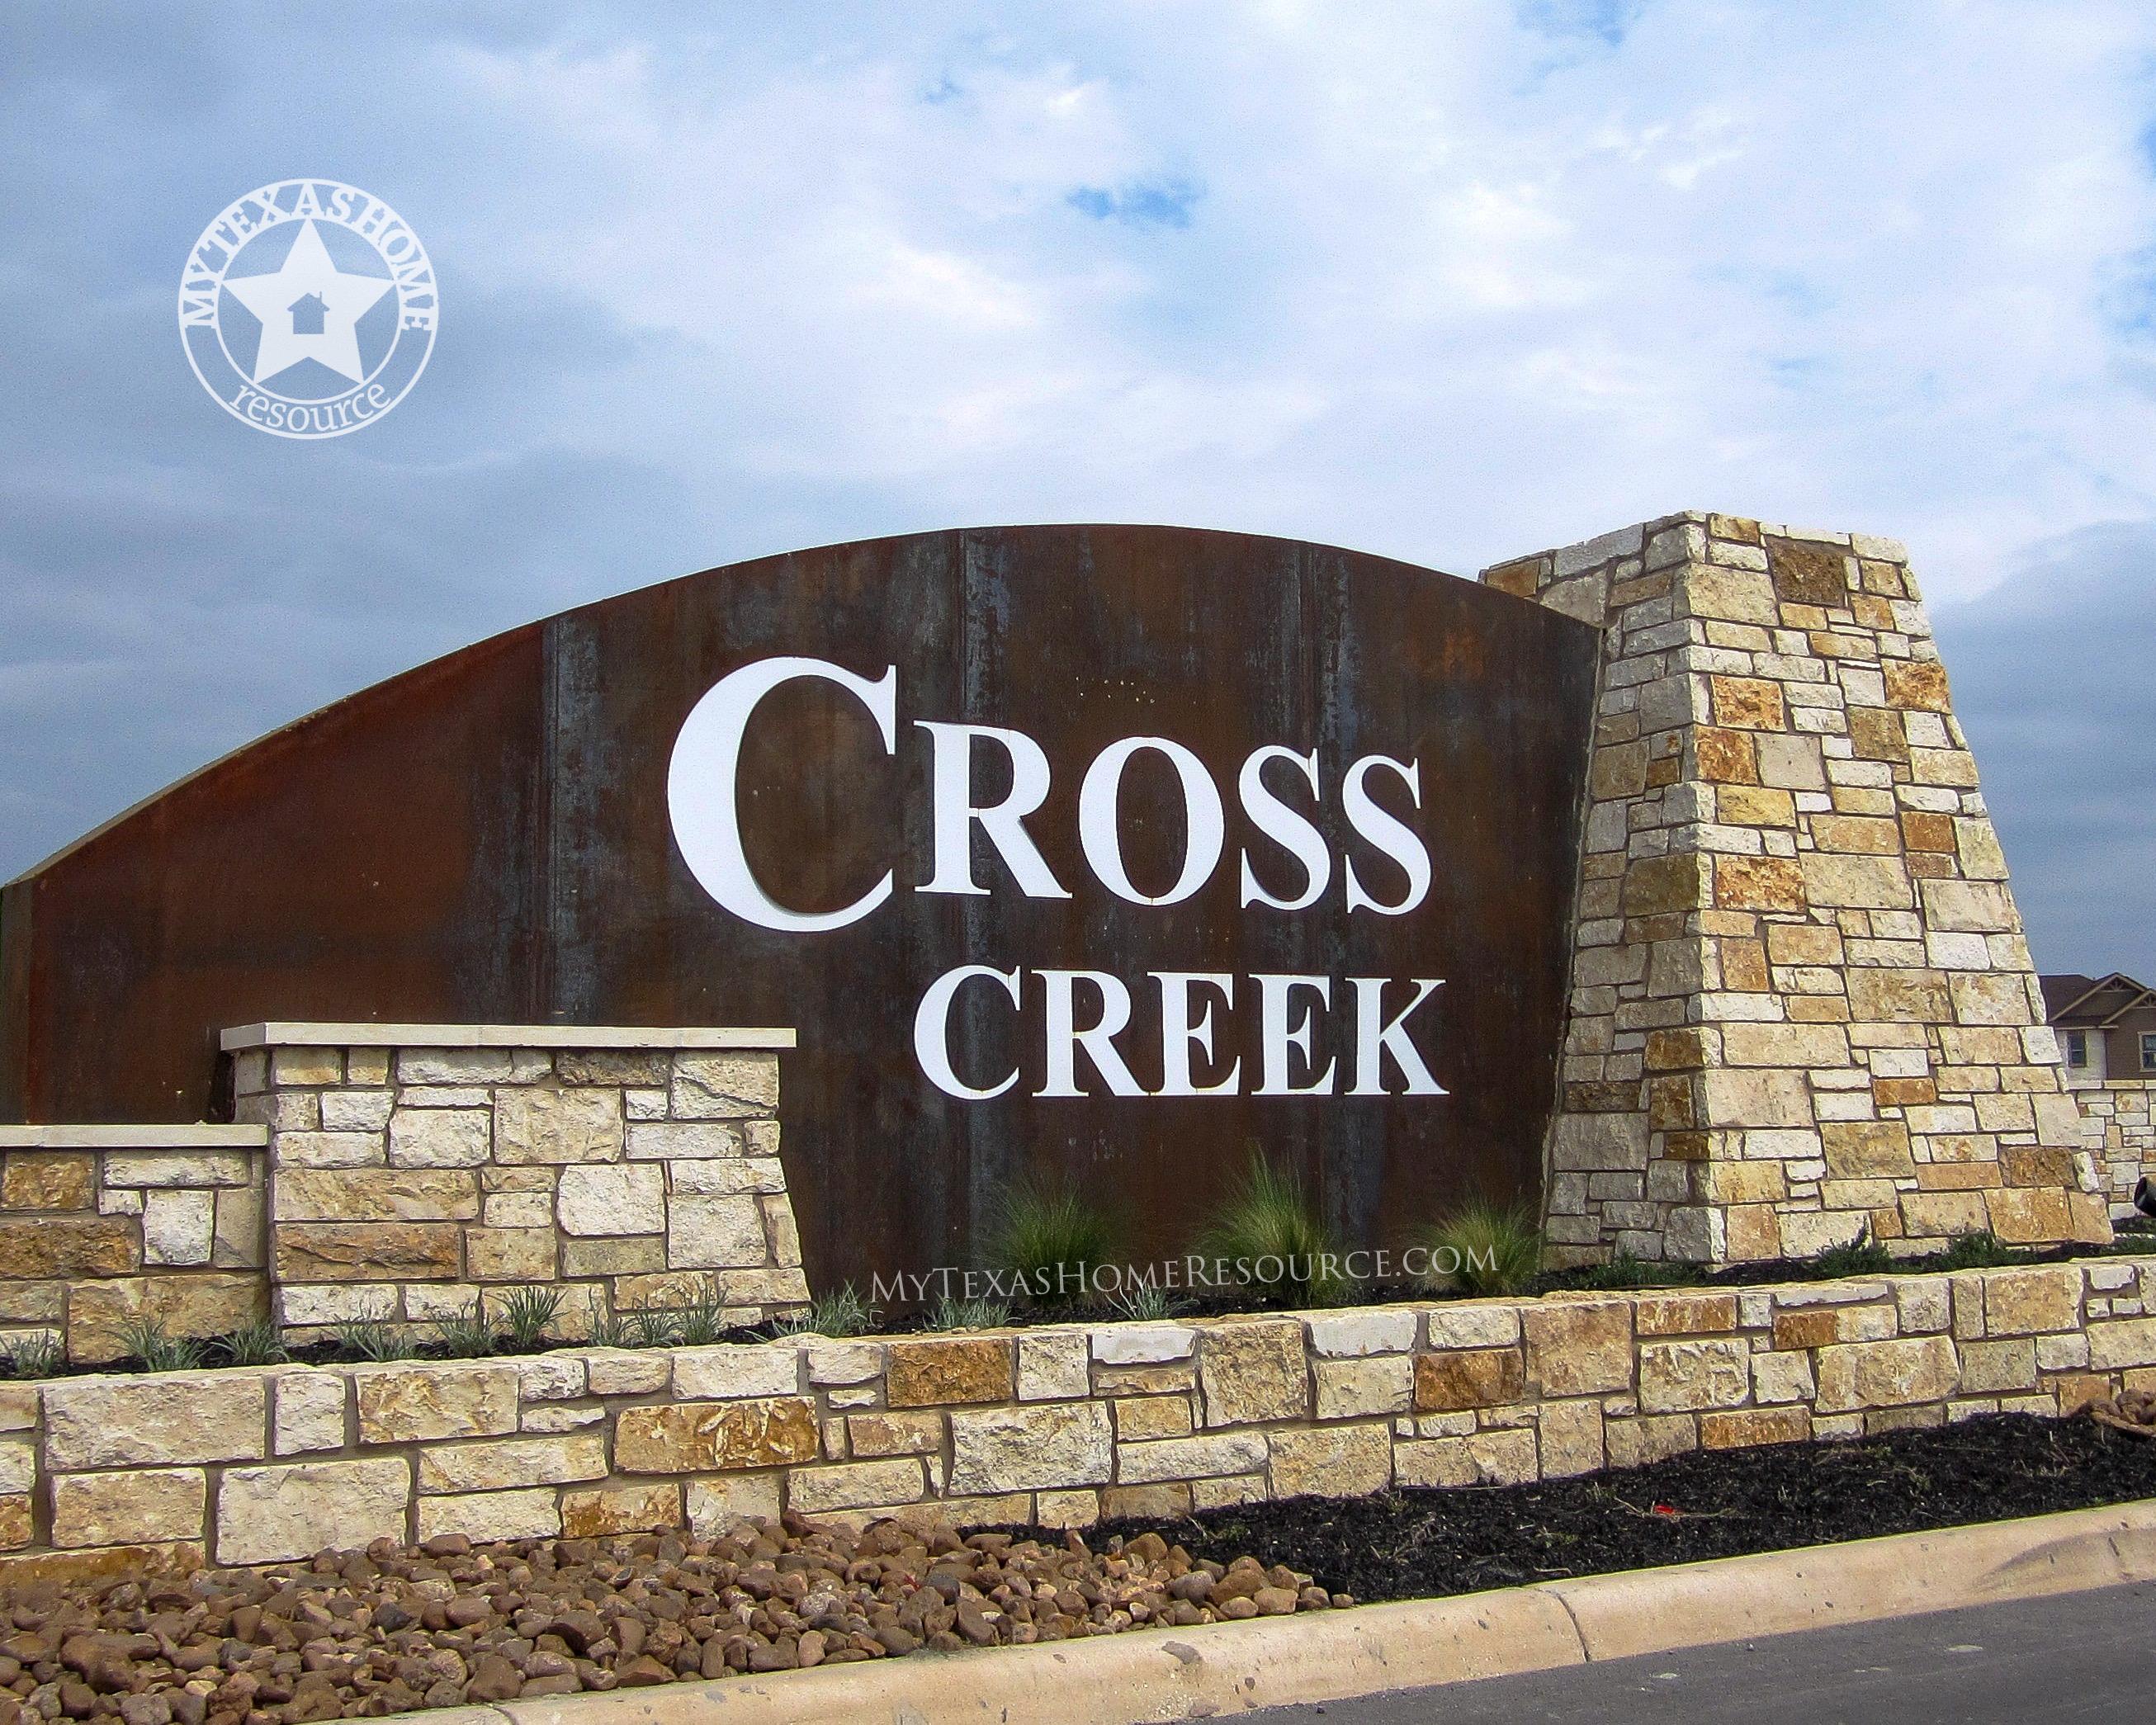 Crosscreek Community San Antonio, TX